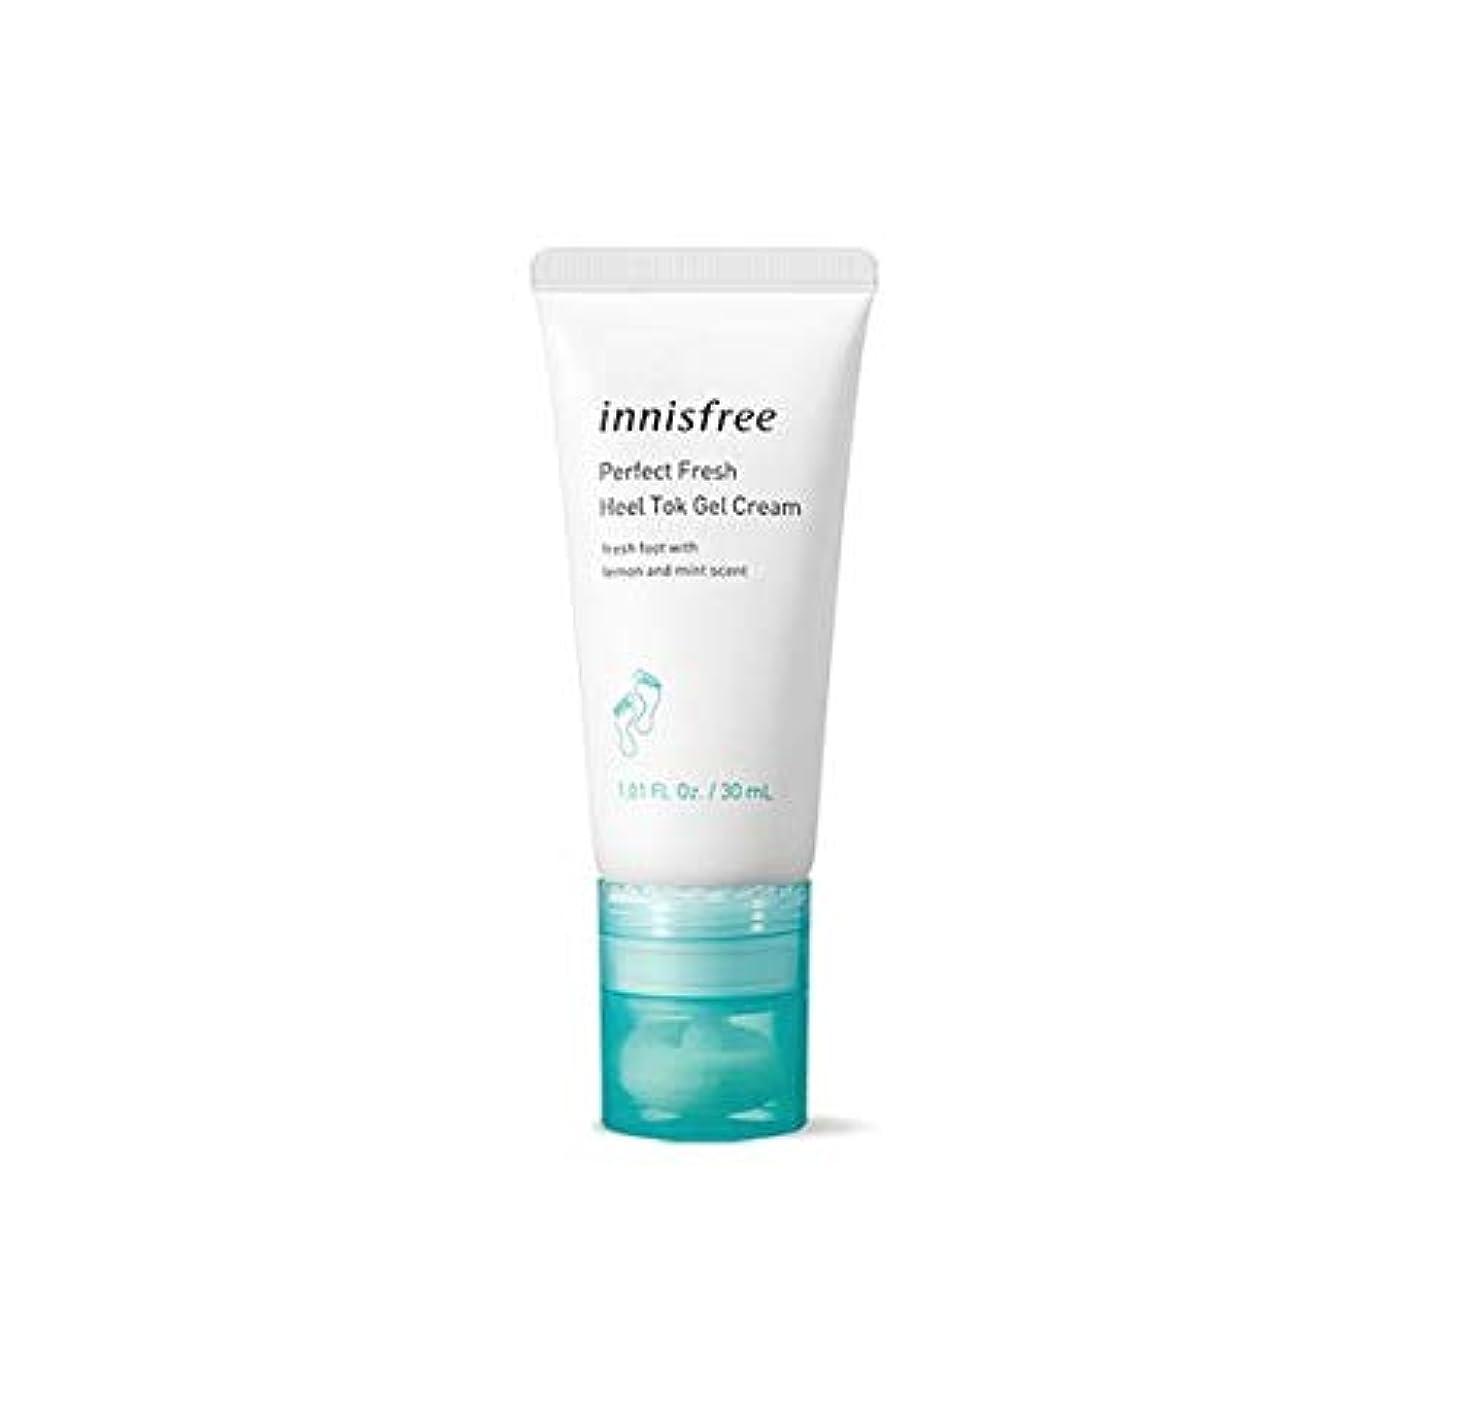 Innisfree パーフェクトフレッシュホールトクジェルクリーム/Perfect Fresh Heel Tok Gel Cream 30ml [並行輸入品]